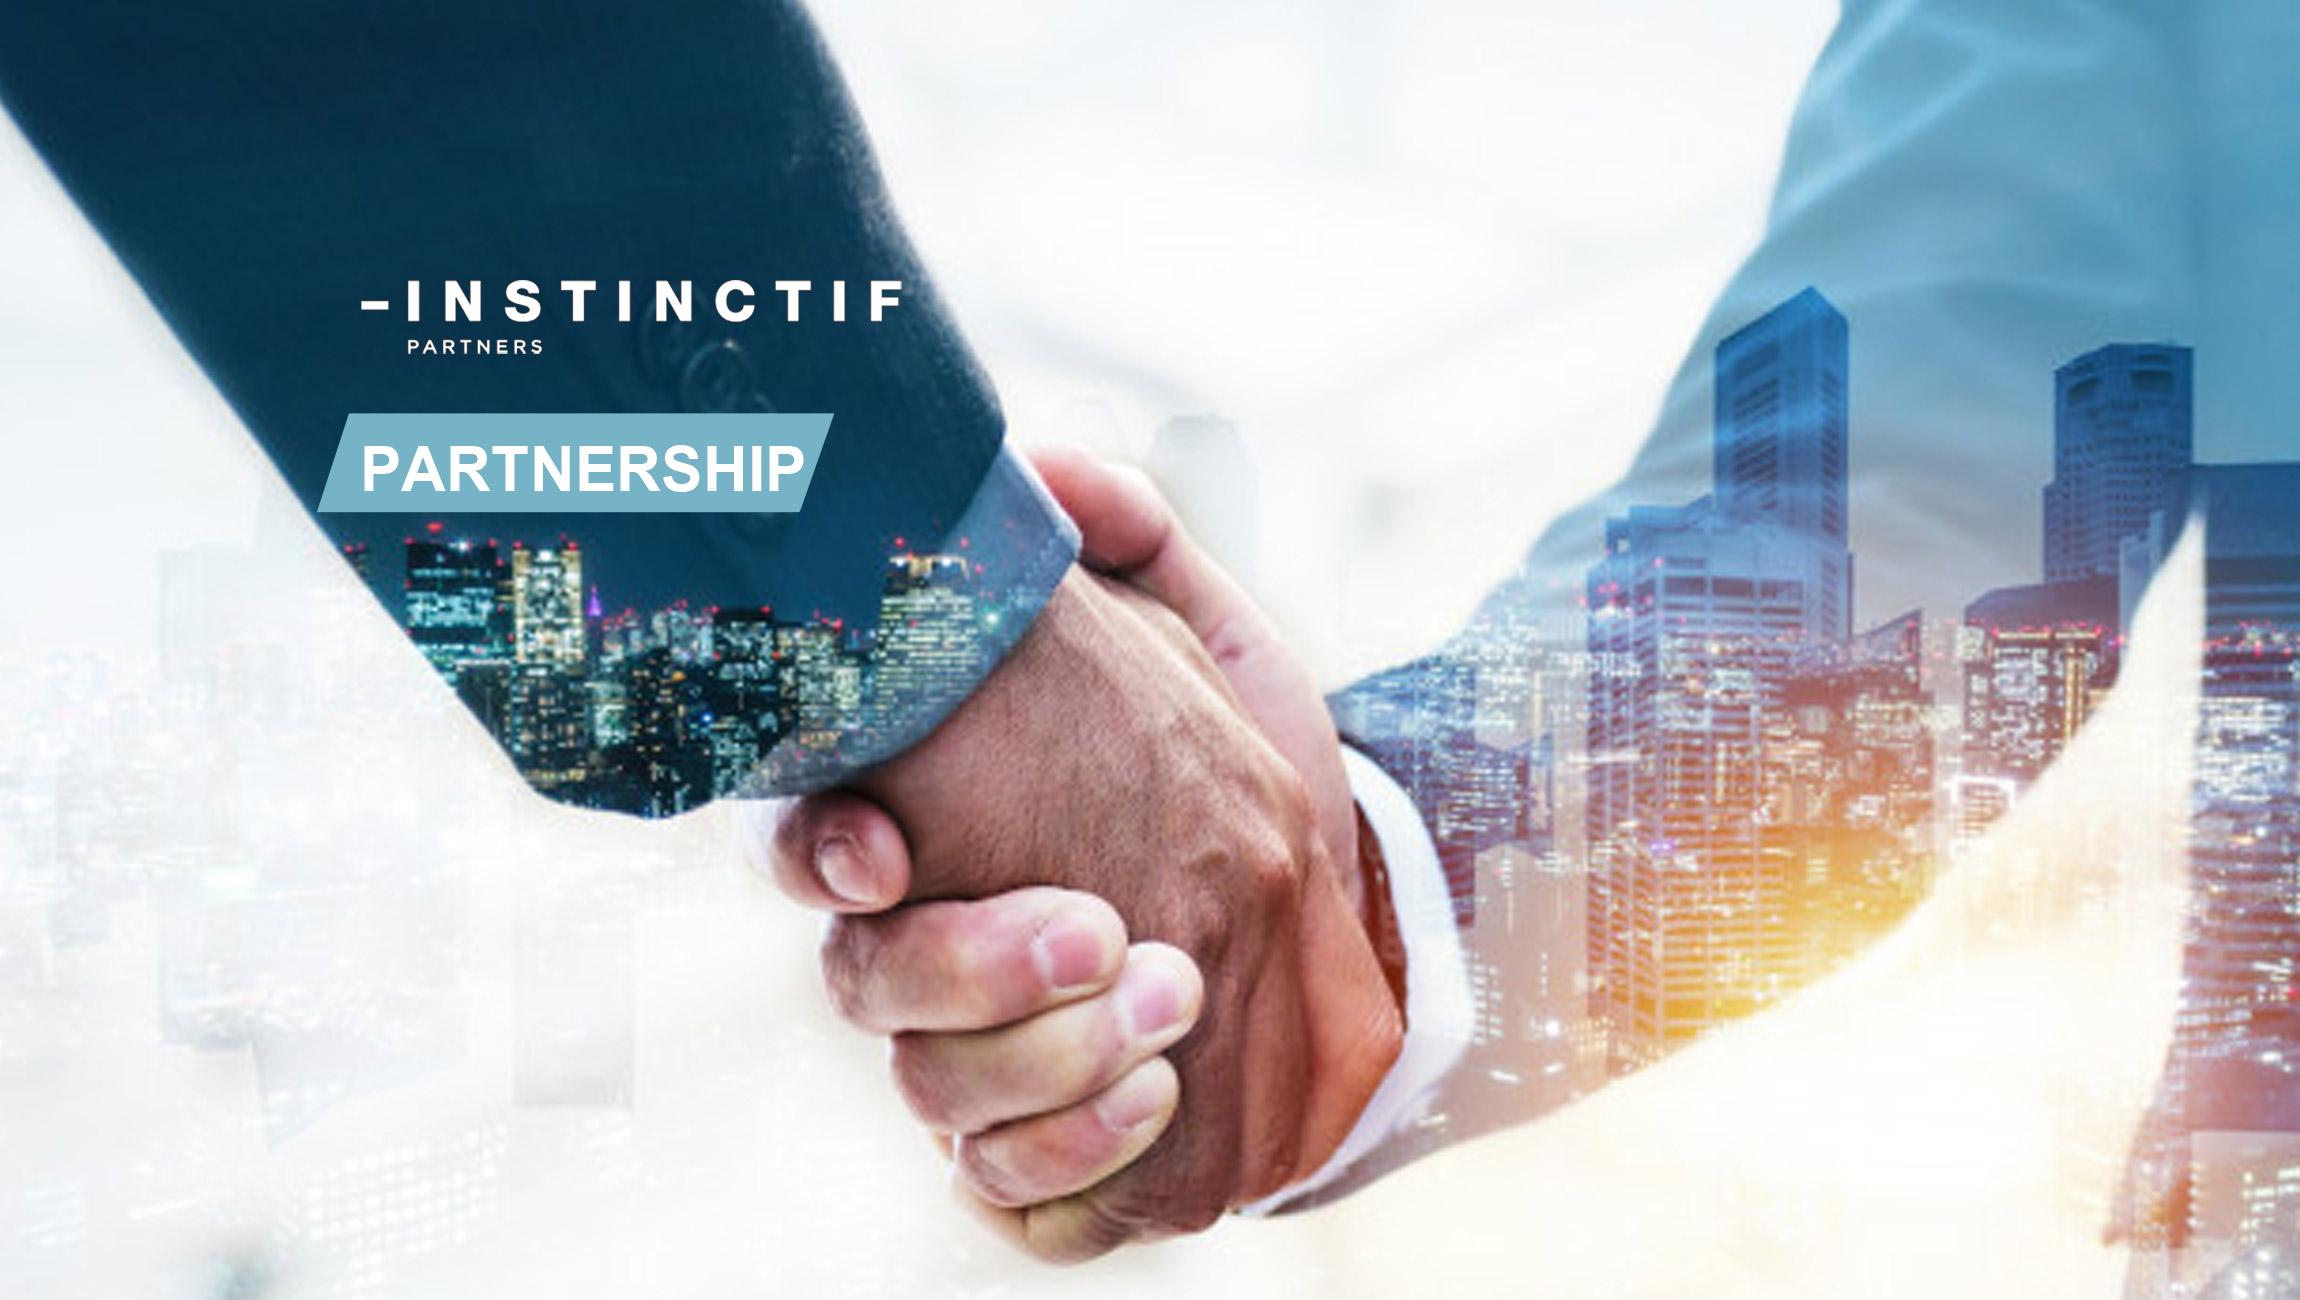 Instinctif Partners Launches Free Digital Tool To Assess ESG Status